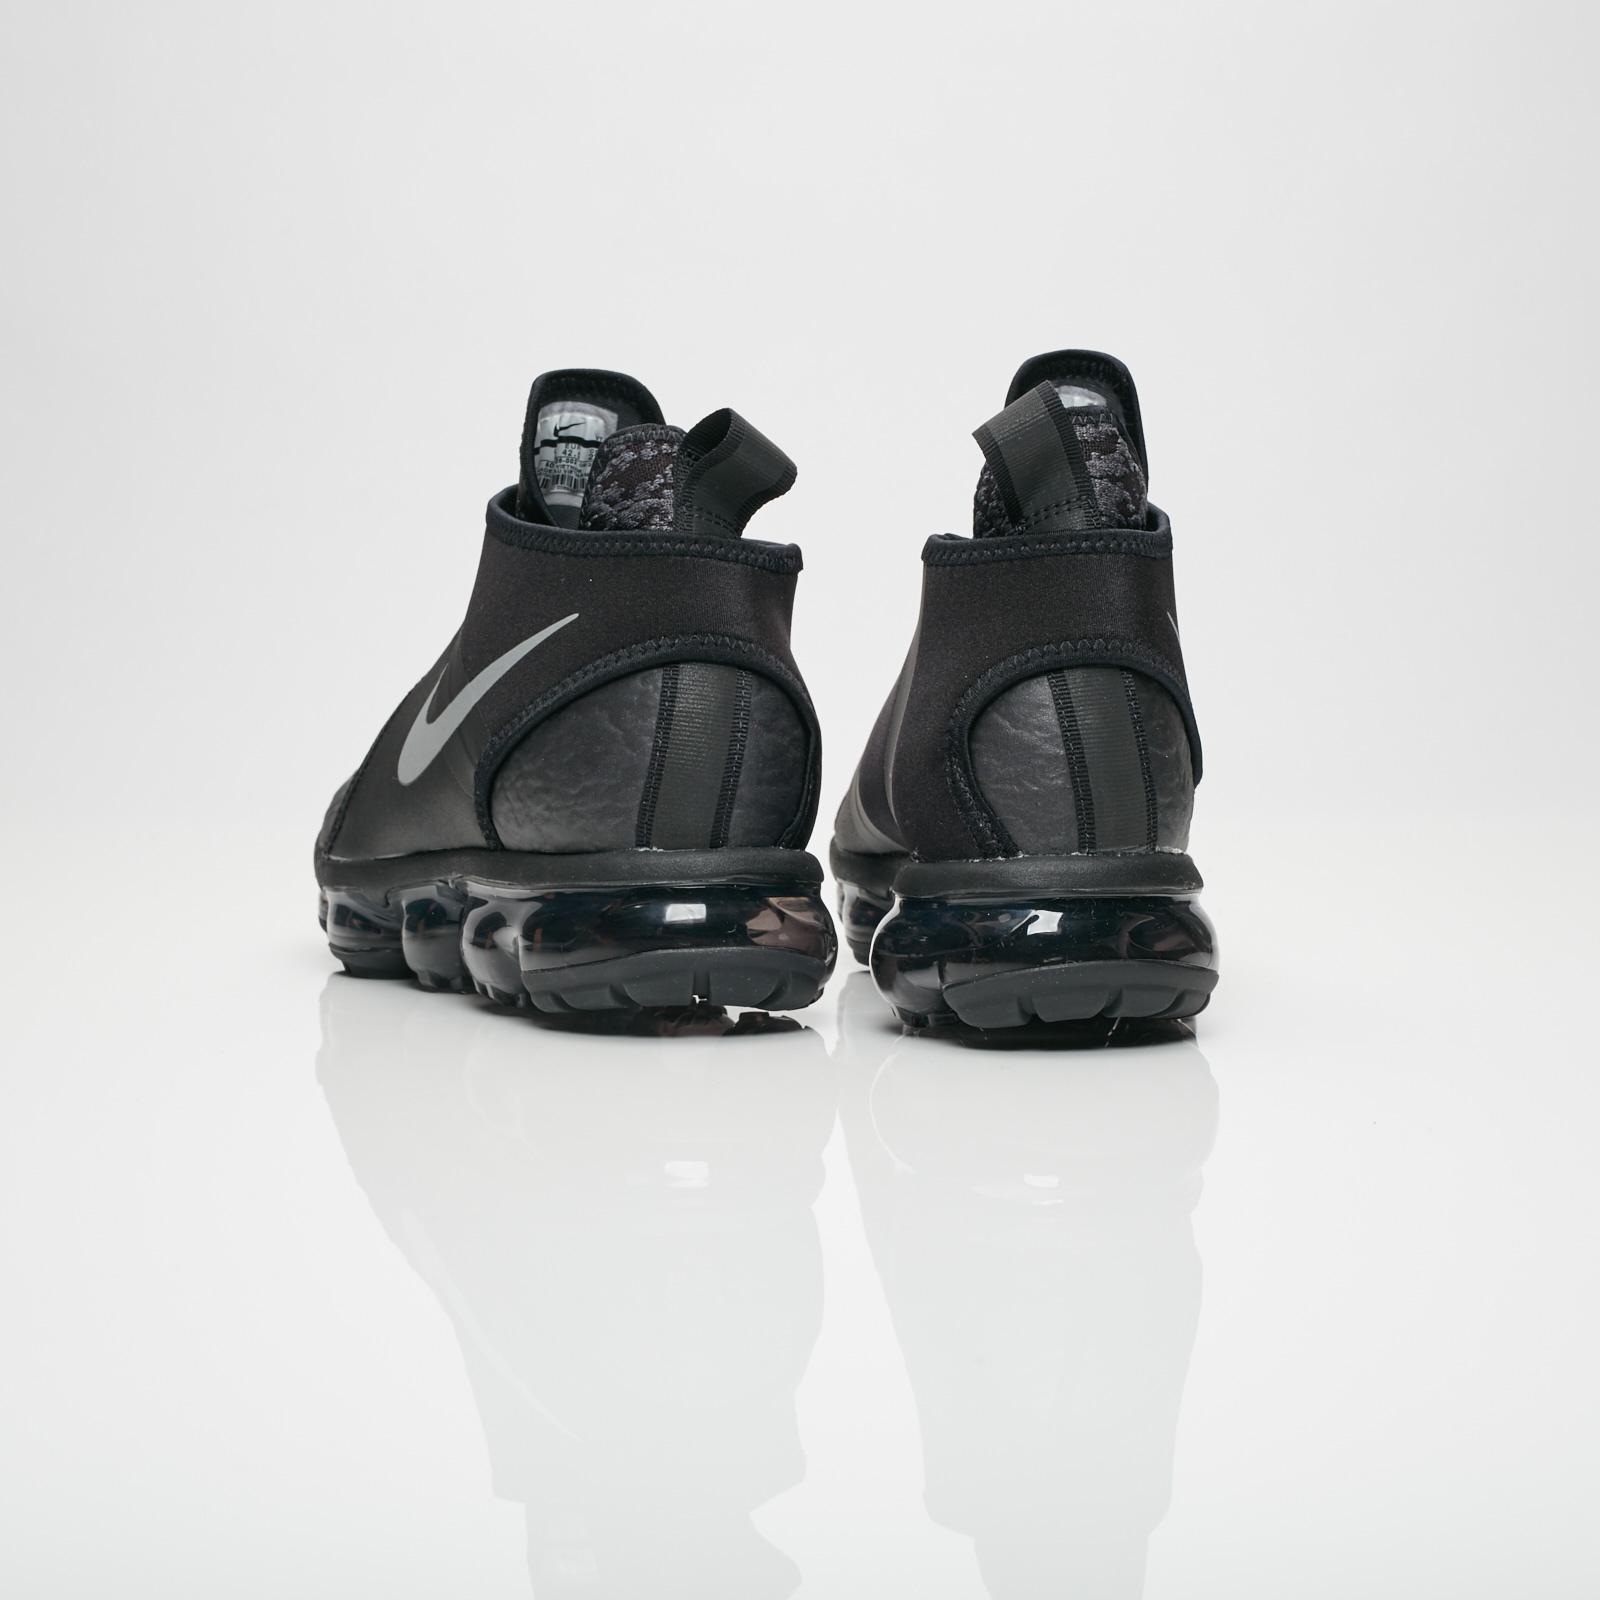 303bc582e8 Nike Nike Air Vapormax Chukka Slip - Ao9326-002 - Sneakersnstuff | sneakers  & streetwear online since 1999